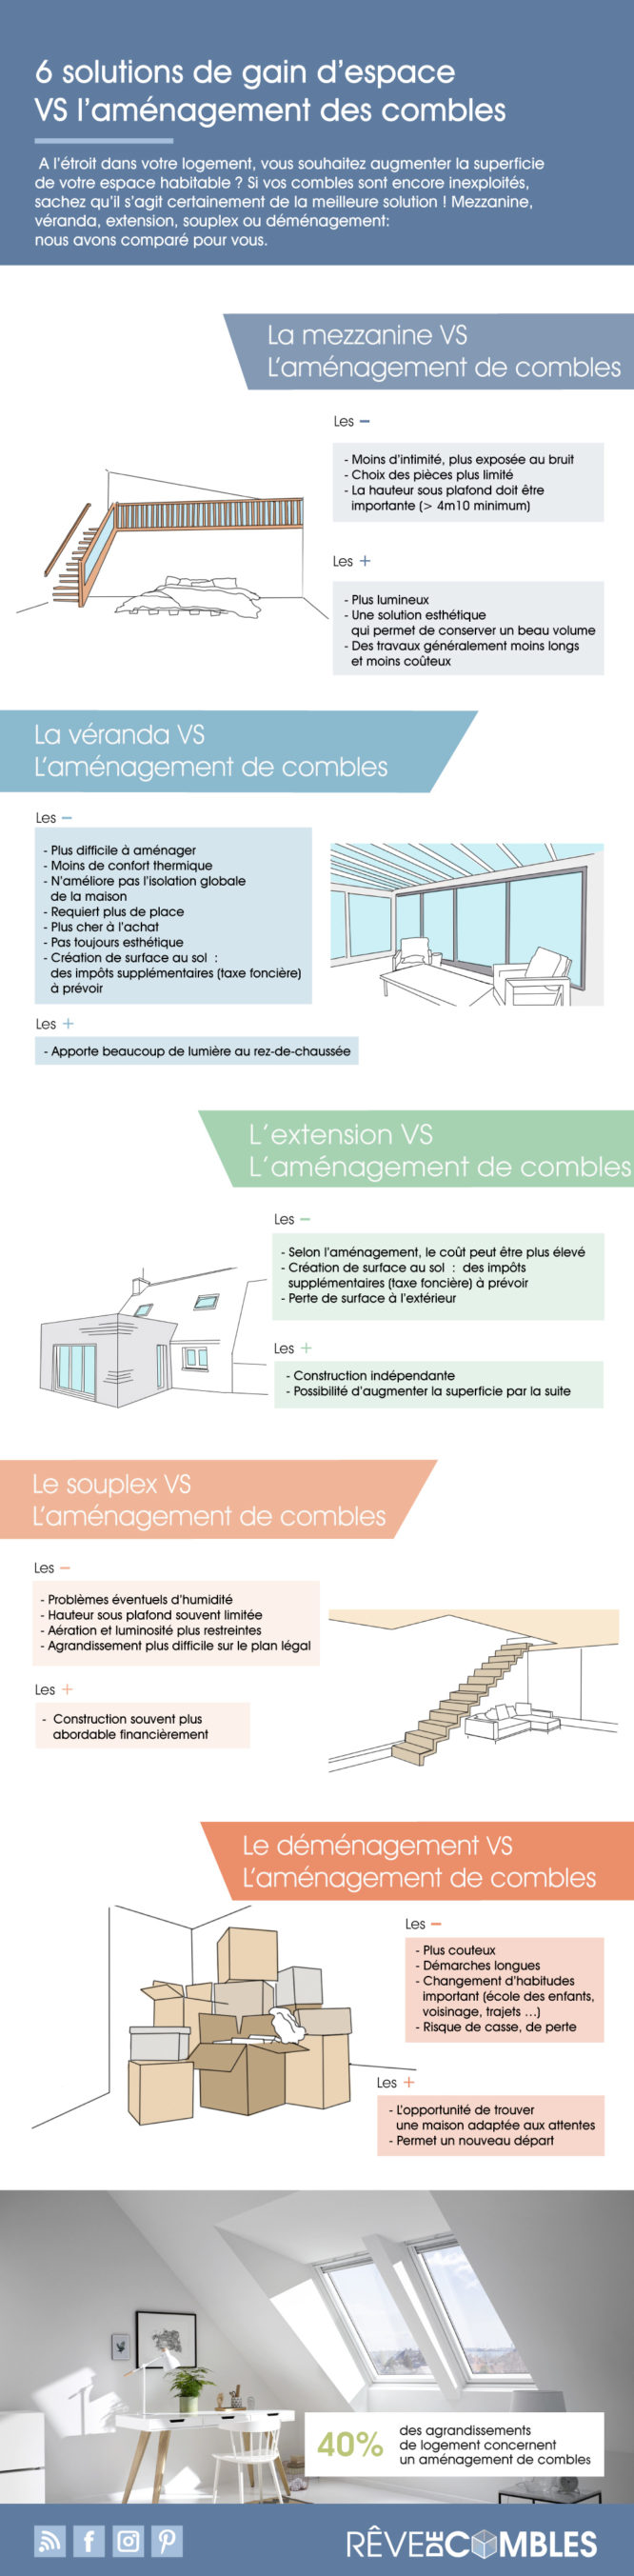 infographie gain espace